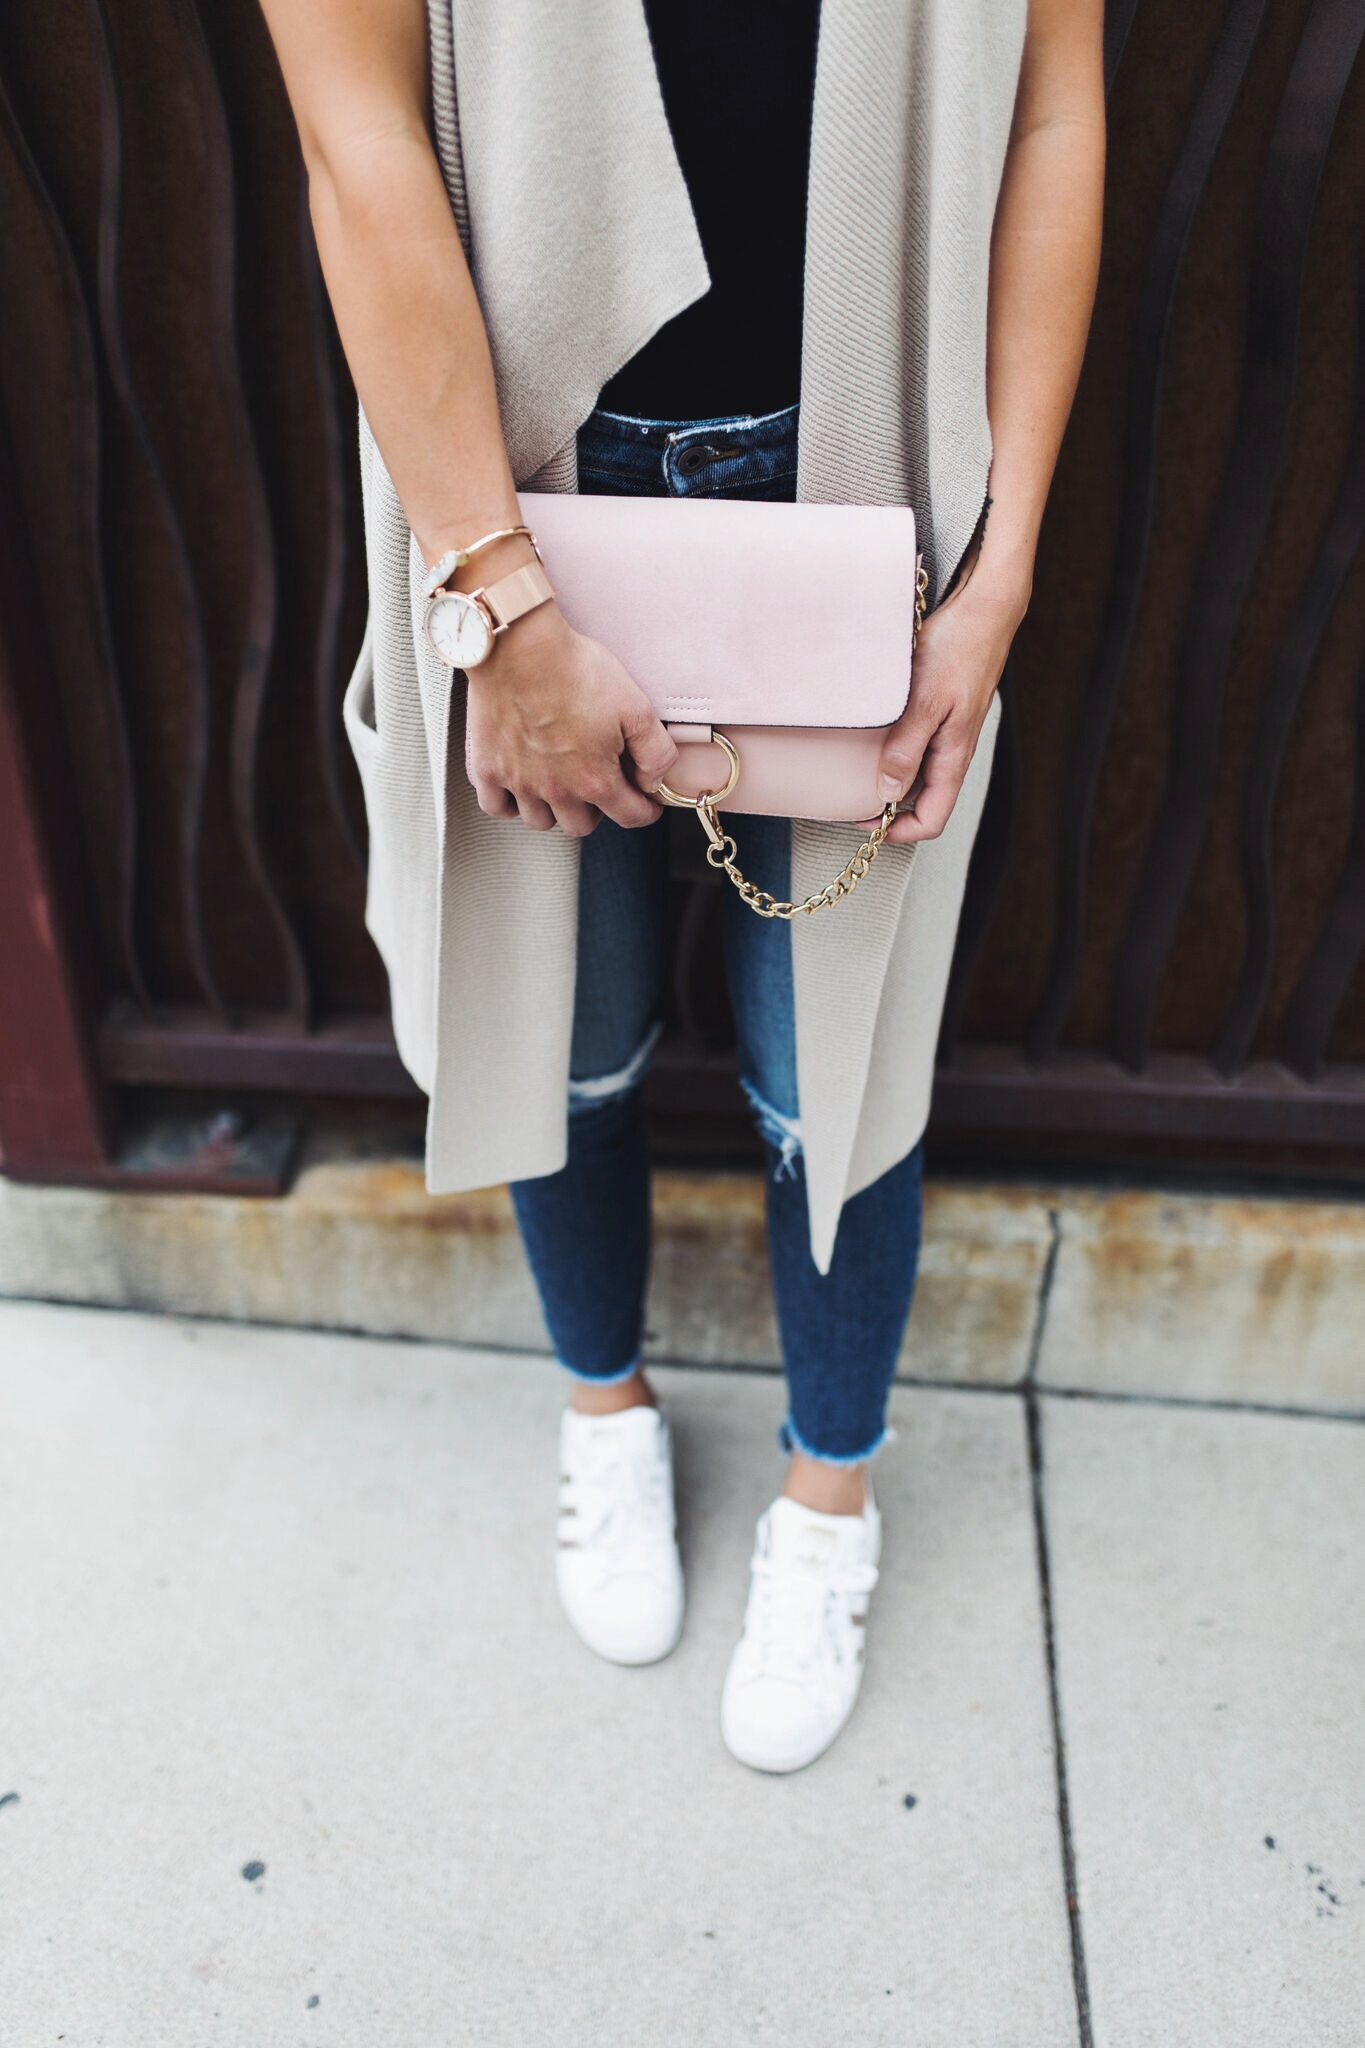 "<img src = ""two-ways-to-wear-a-simple-black-tee.jpg"" alt =""Denver-fashion-blogger-shows-different-ways-to-style-a-simple-black-tee-worn-with-a-long-sweater-knit-vest-joes-jeans-blondie-destroyed-ankle-skinny-jeans-coppola-adidas-superstars-rose-gold-and-a-pink-handbag"">"